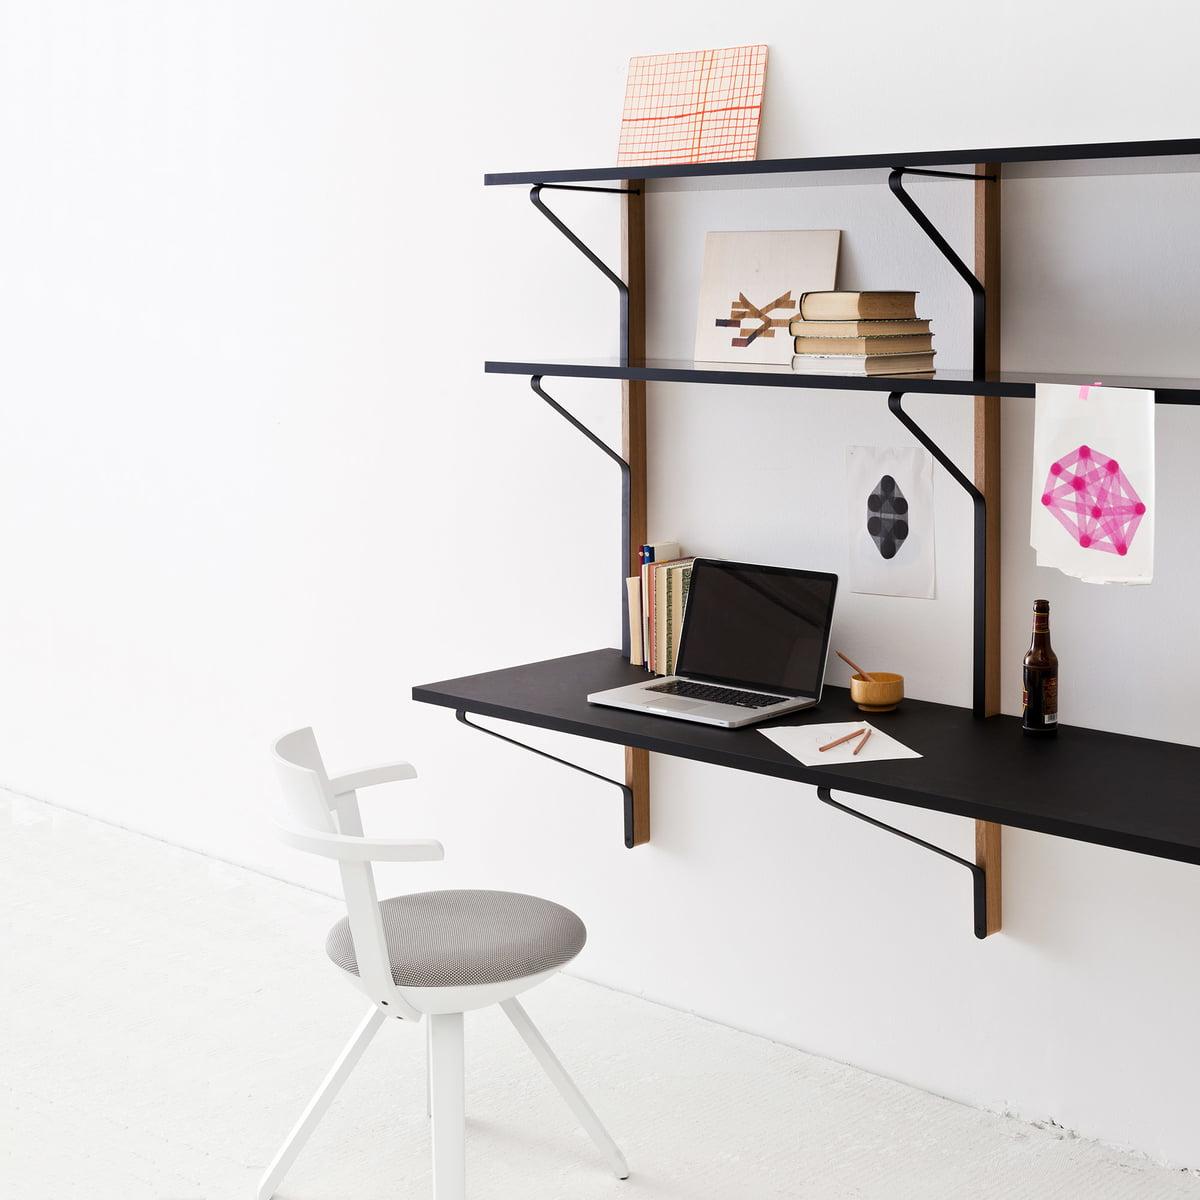 kaari wall shelf with desk by artek. Black Bedroom Furniture Sets. Home Design Ideas